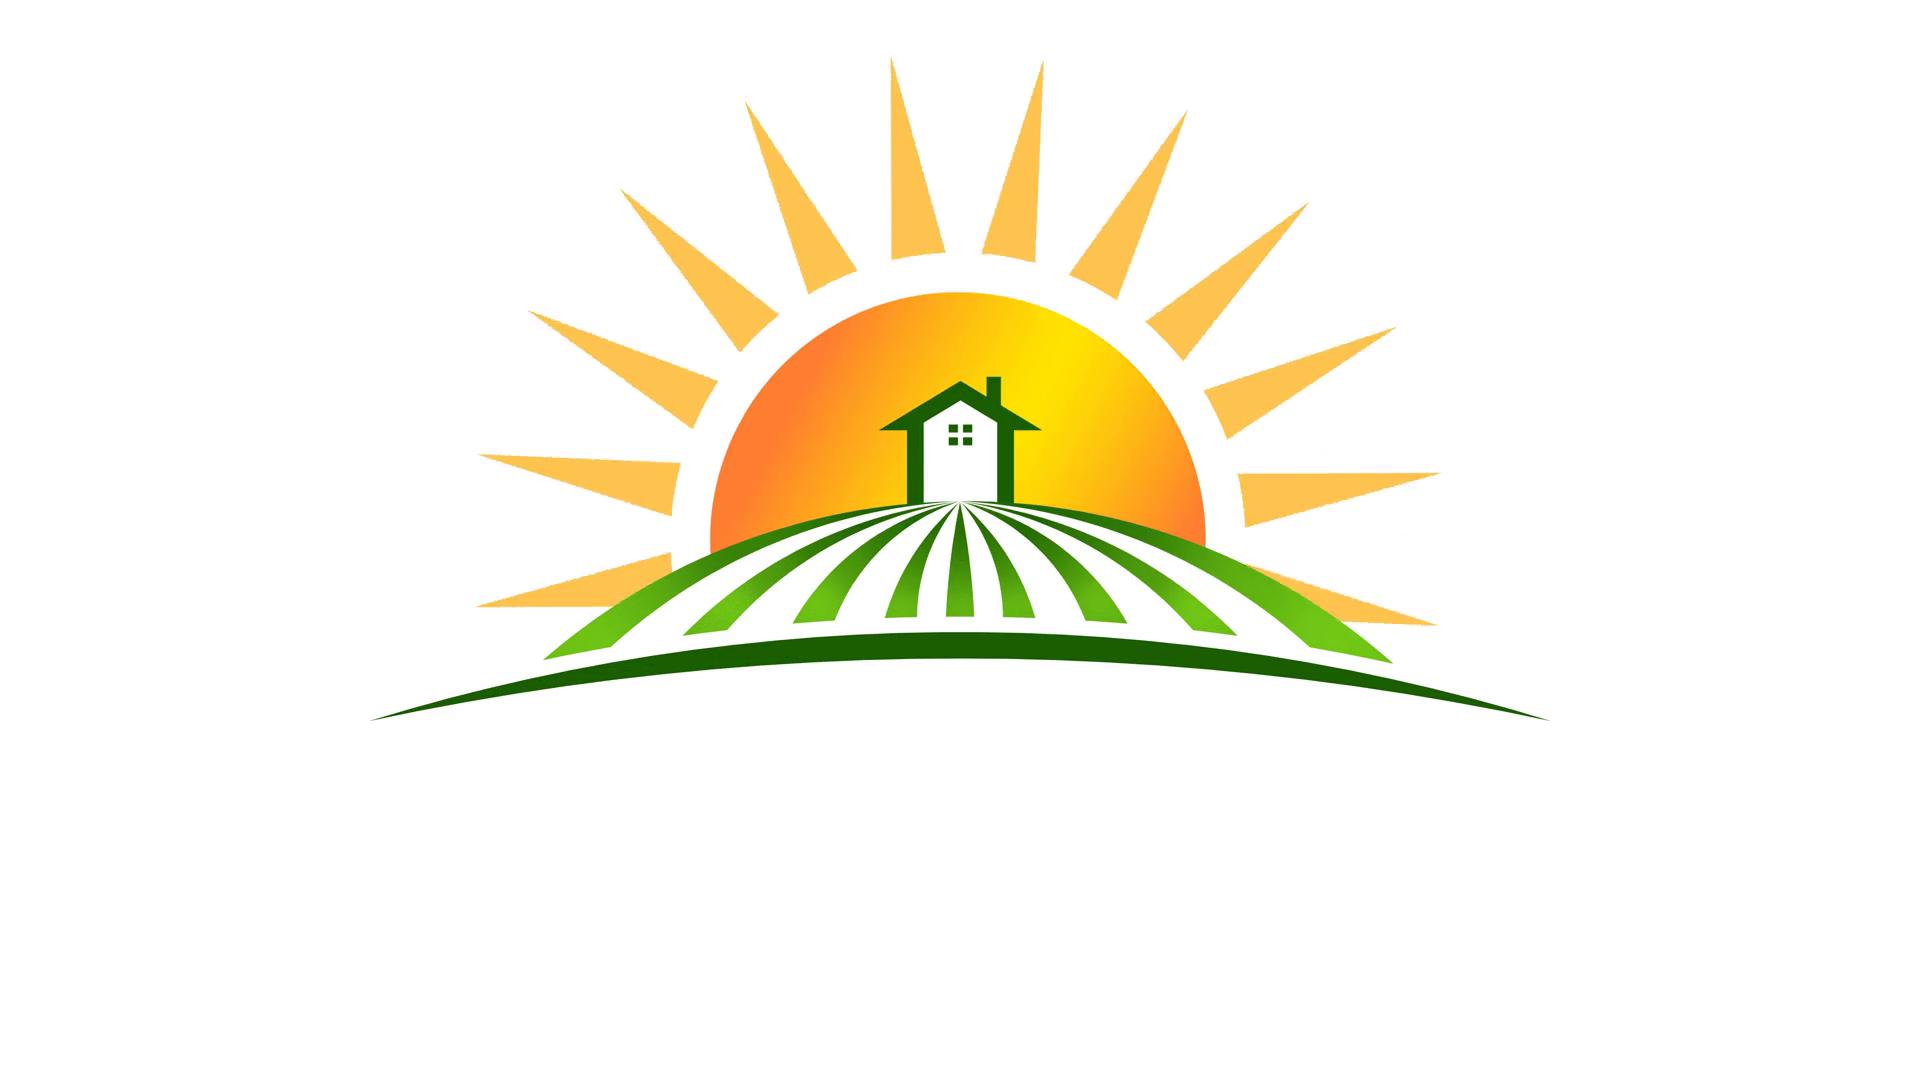 Sun With House In Field Logo Video Animation Hd Motion Background Videoblocks Sunshine Logo Home Logo Animation Background